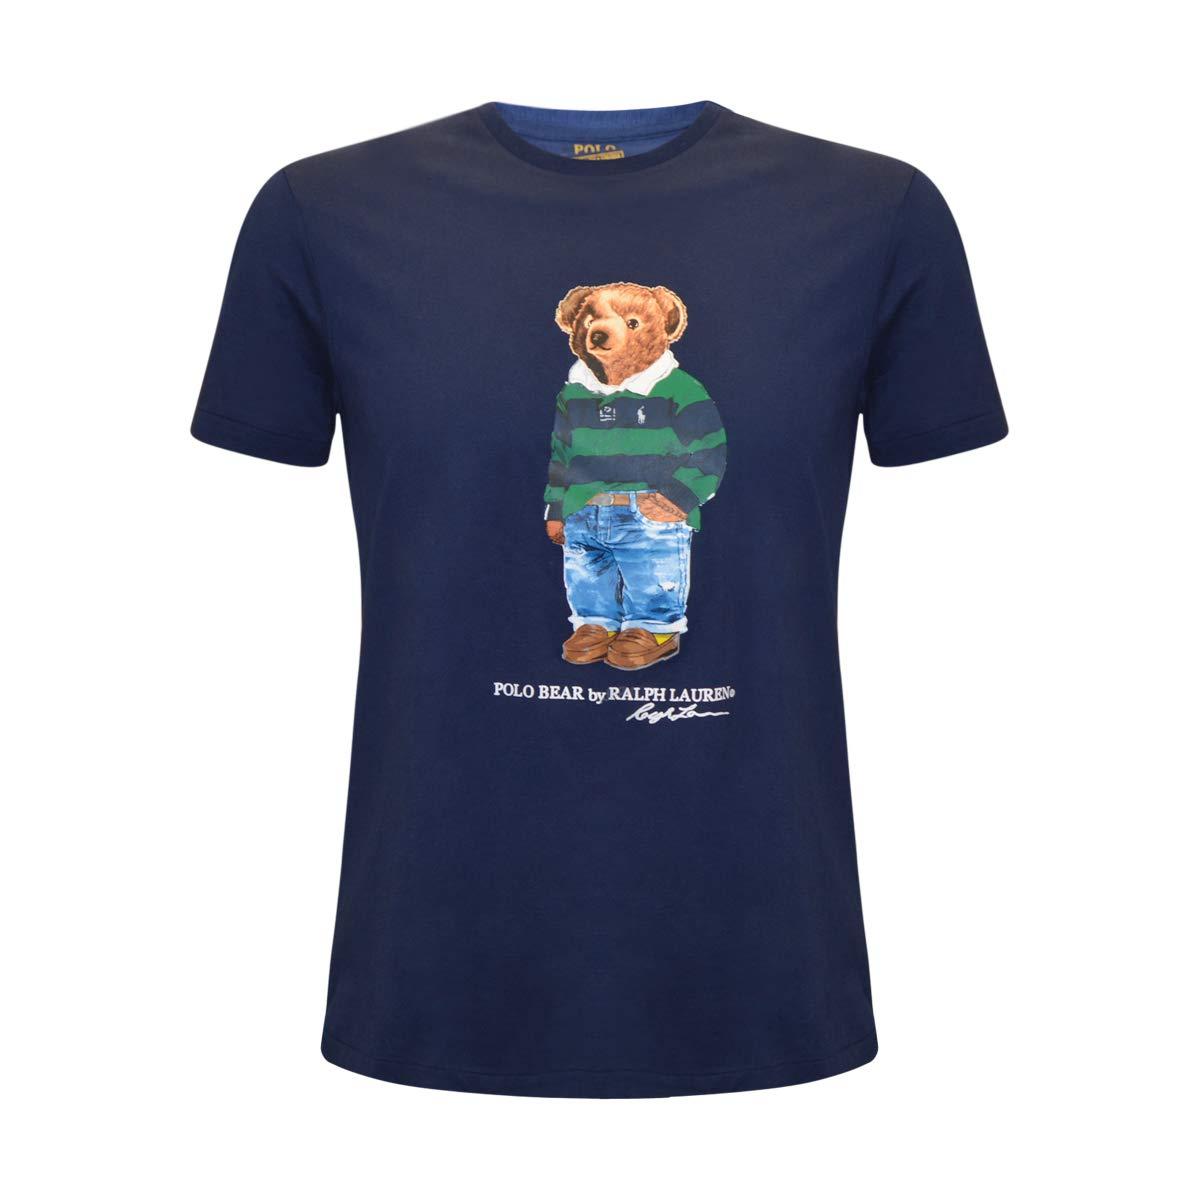 38532f4586a9 Amazon.com  Polo Ralph Lauren Mens Limited Polo Bear T-Shirt  Clothing